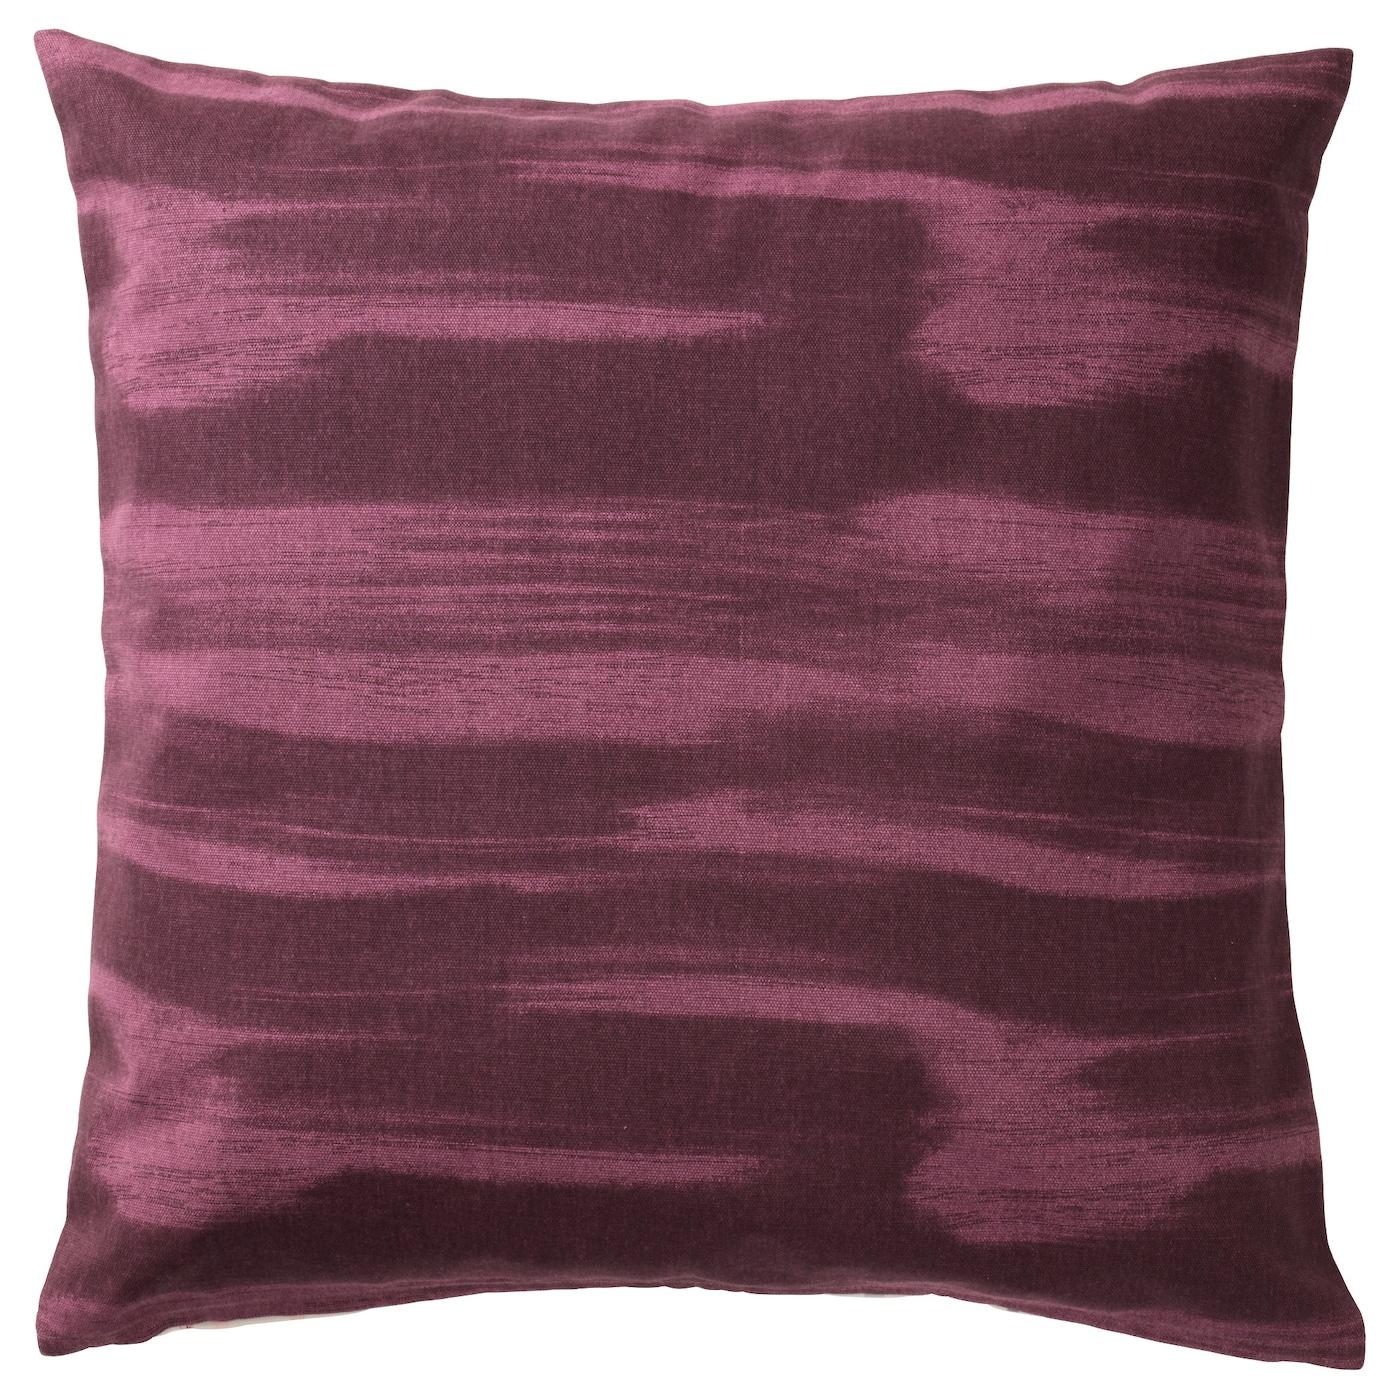 skogsn va housse de coussin beige rose 50x50 cm ikea. Black Bedroom Furniture Sets. Home Design Ideas